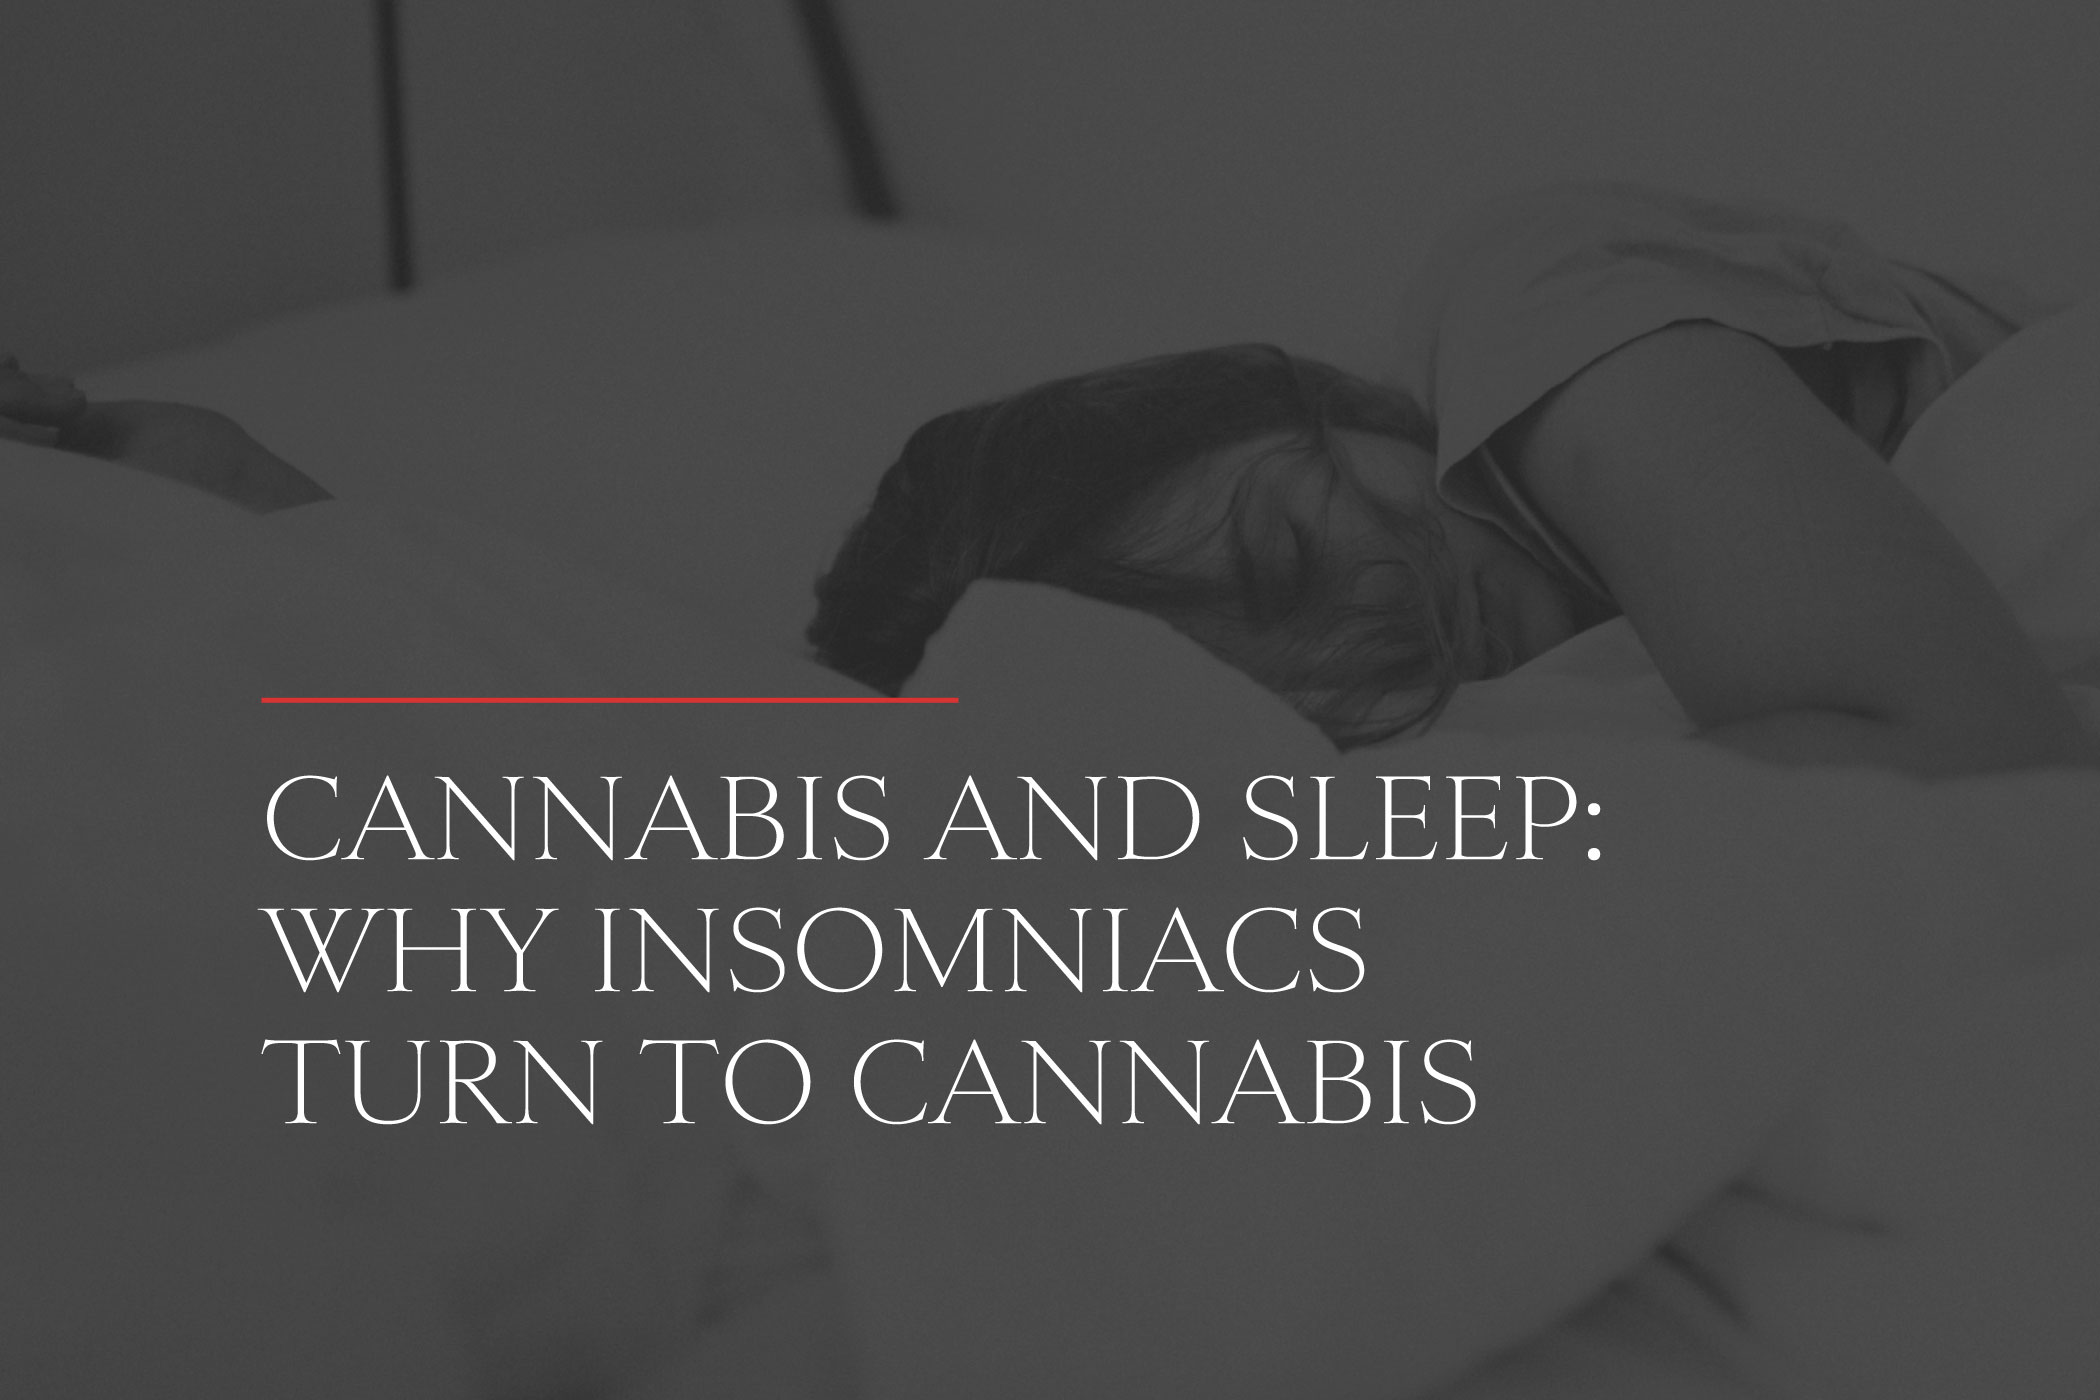 Cannabis and Sleep Why Insomniacs Turn to Cannabis